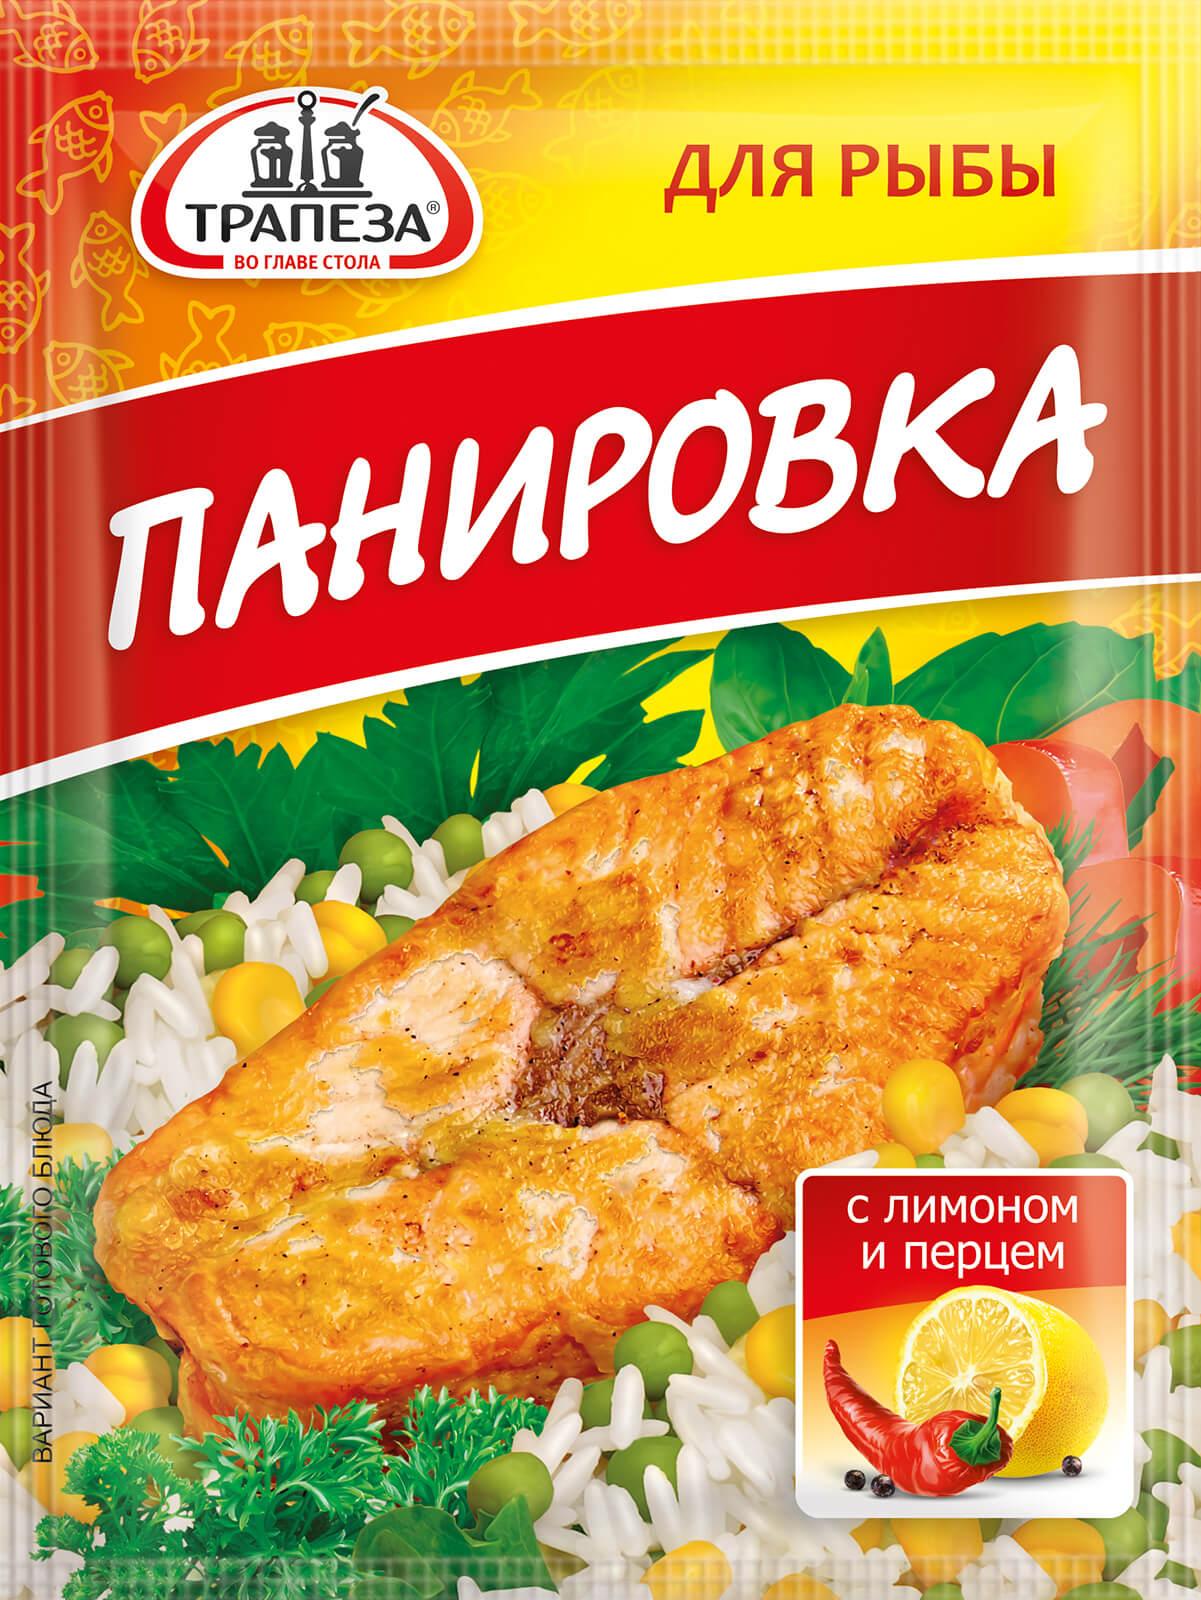 Панировка для рыбы Трапеза 70г.